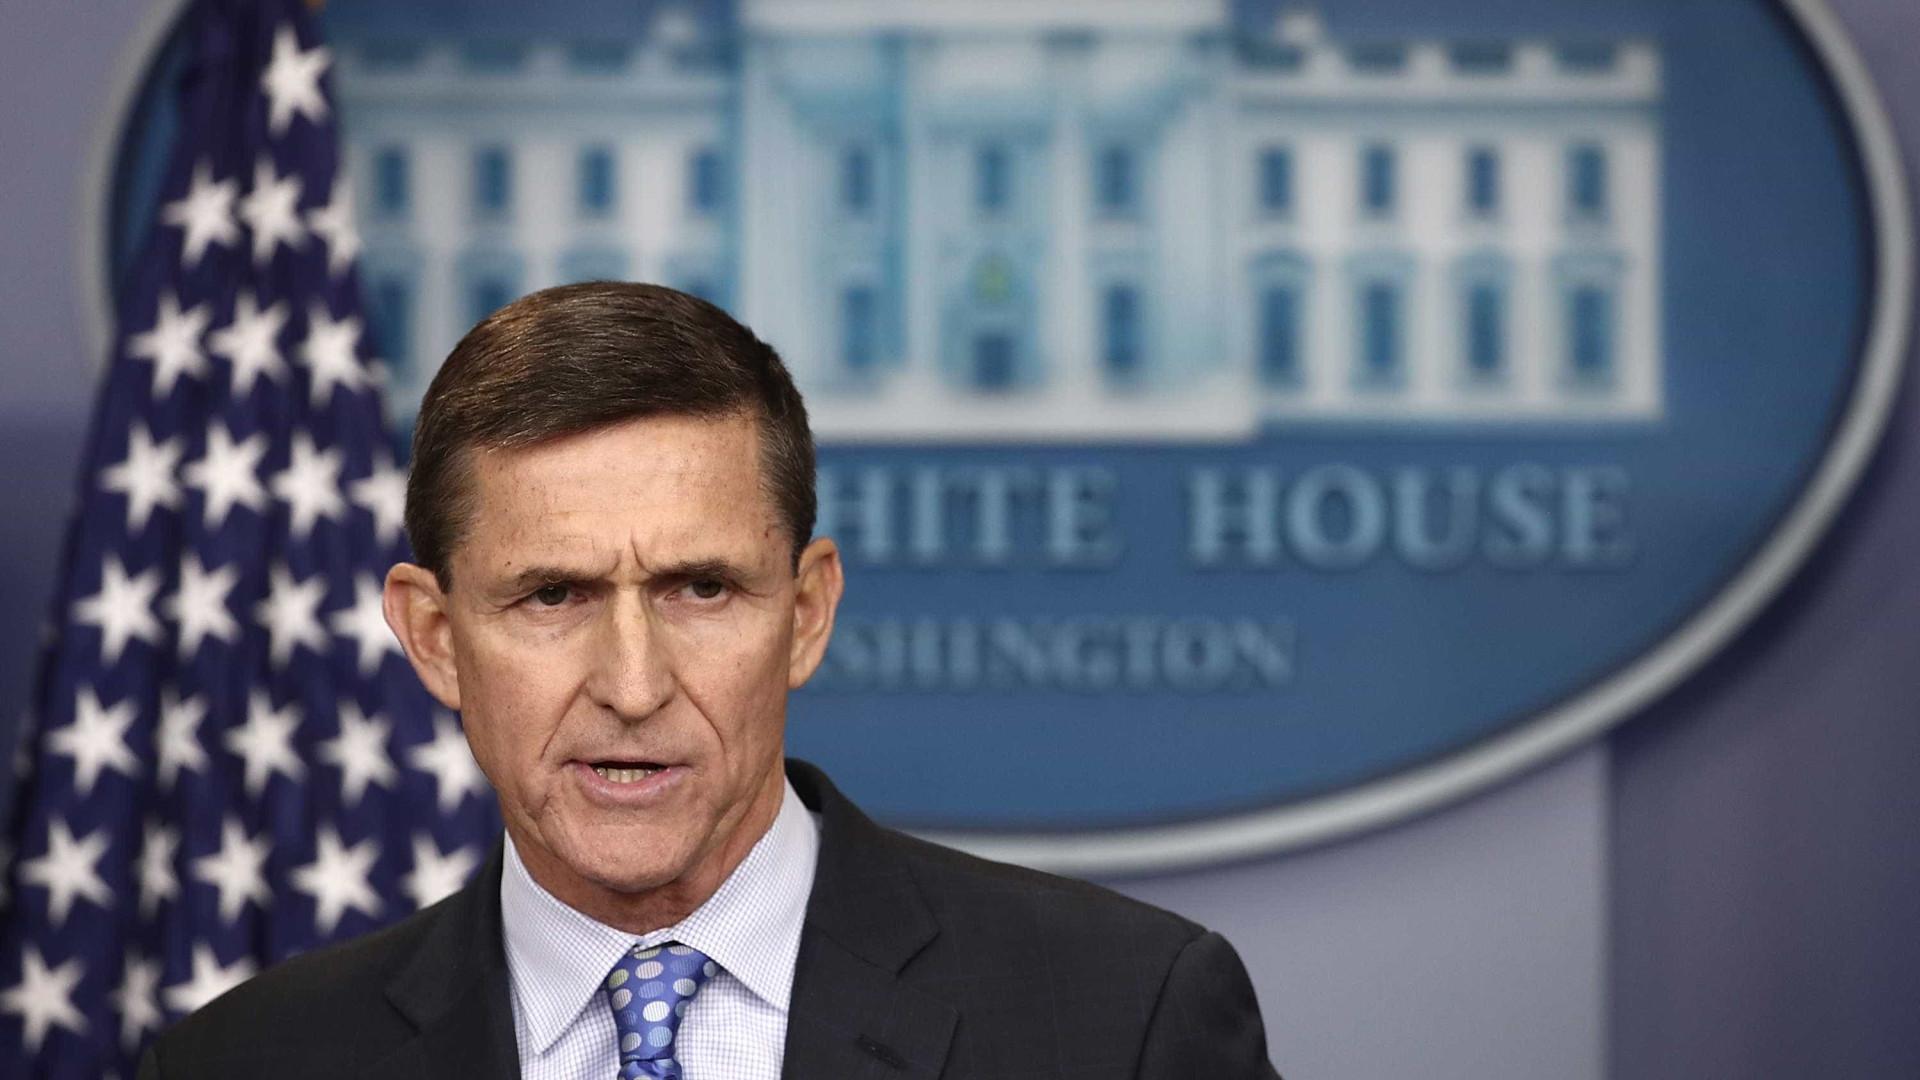 Mueller investiga envolvimento de Flynn em tentativa de rapto de imã muçulmano